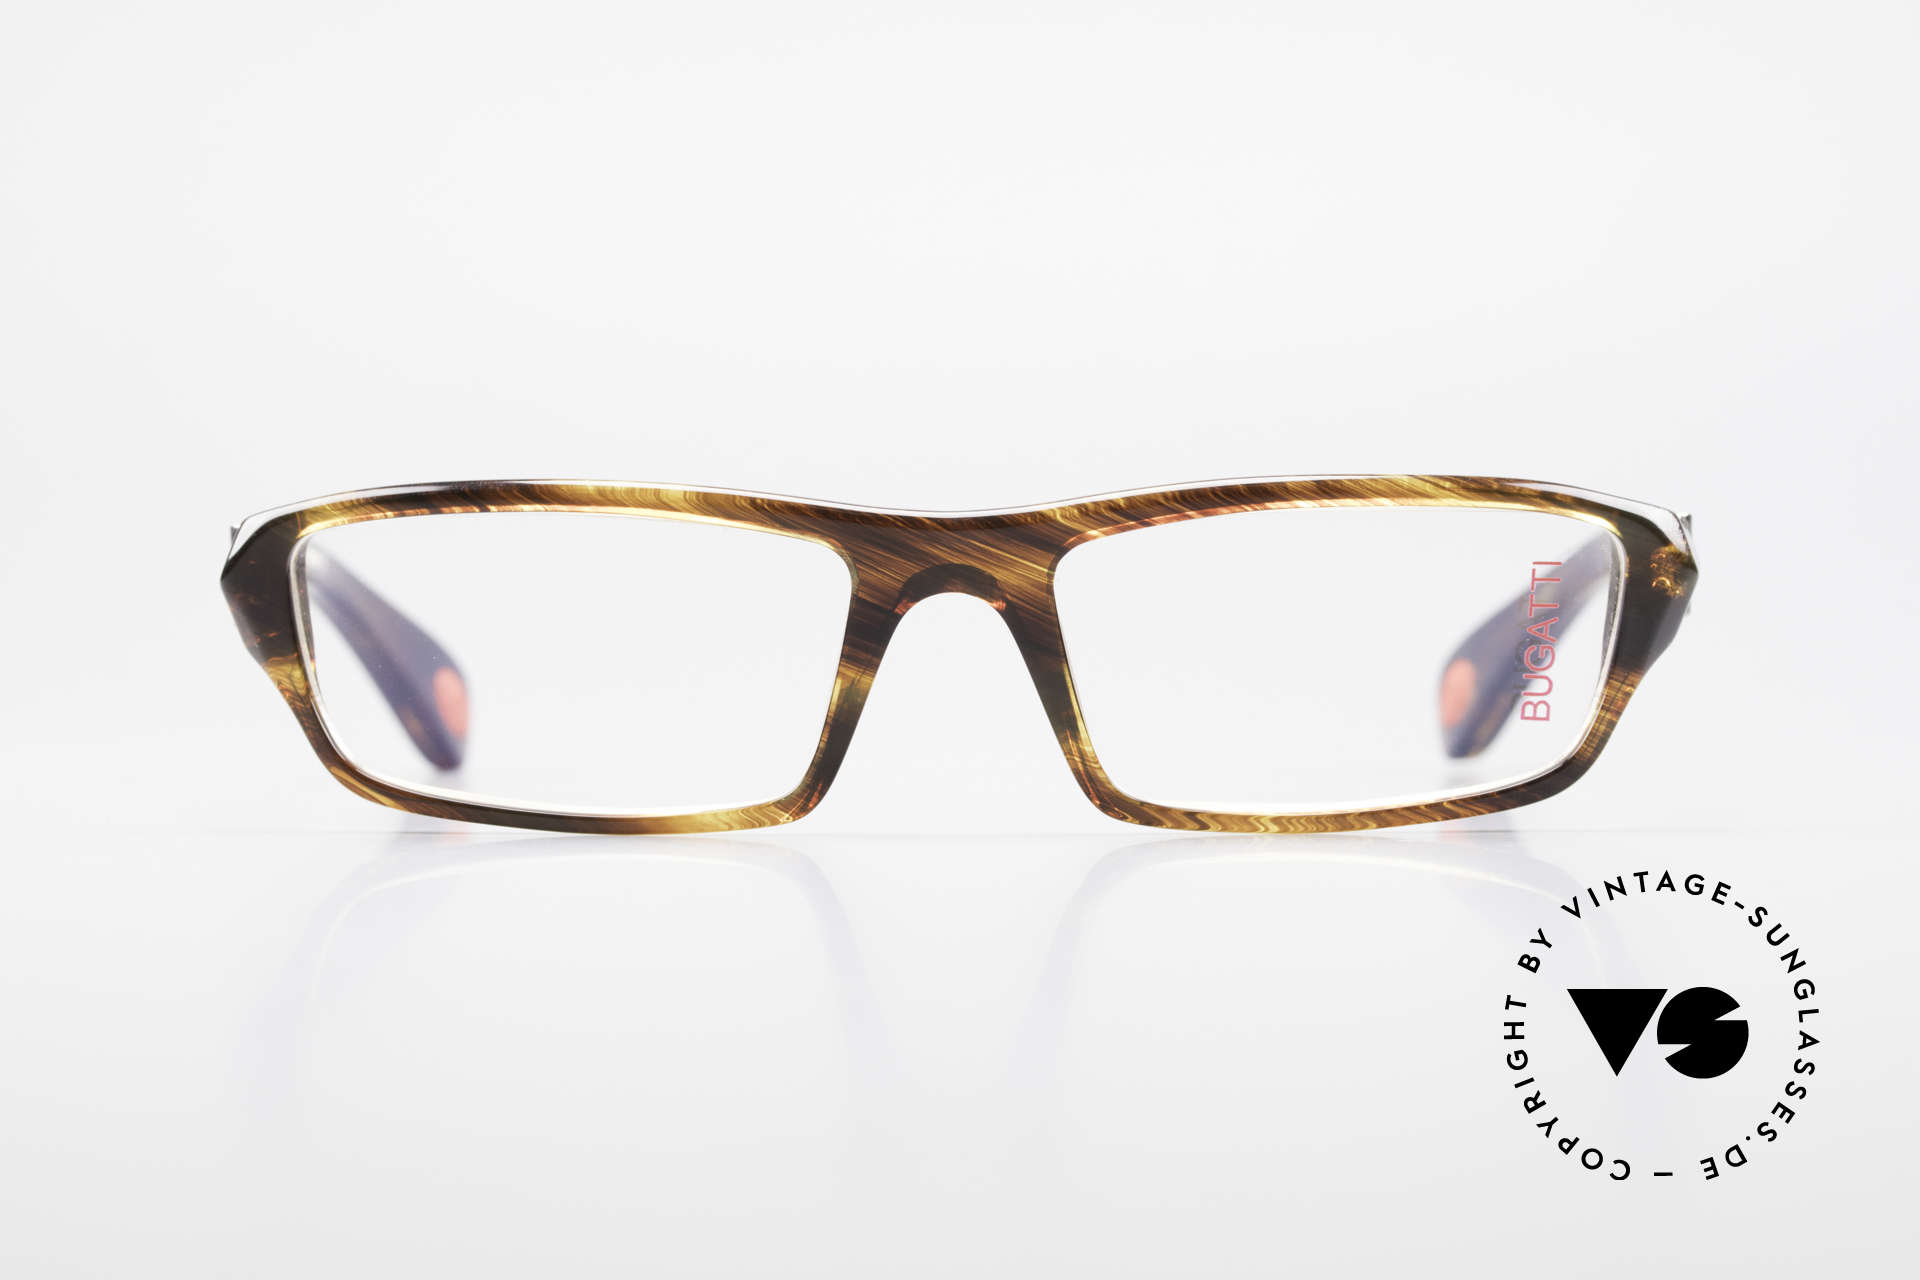 Bugatti 470 Rare Designer Eyeglasses Men, TOP-NOTCH quality of all frame components, Made for Men